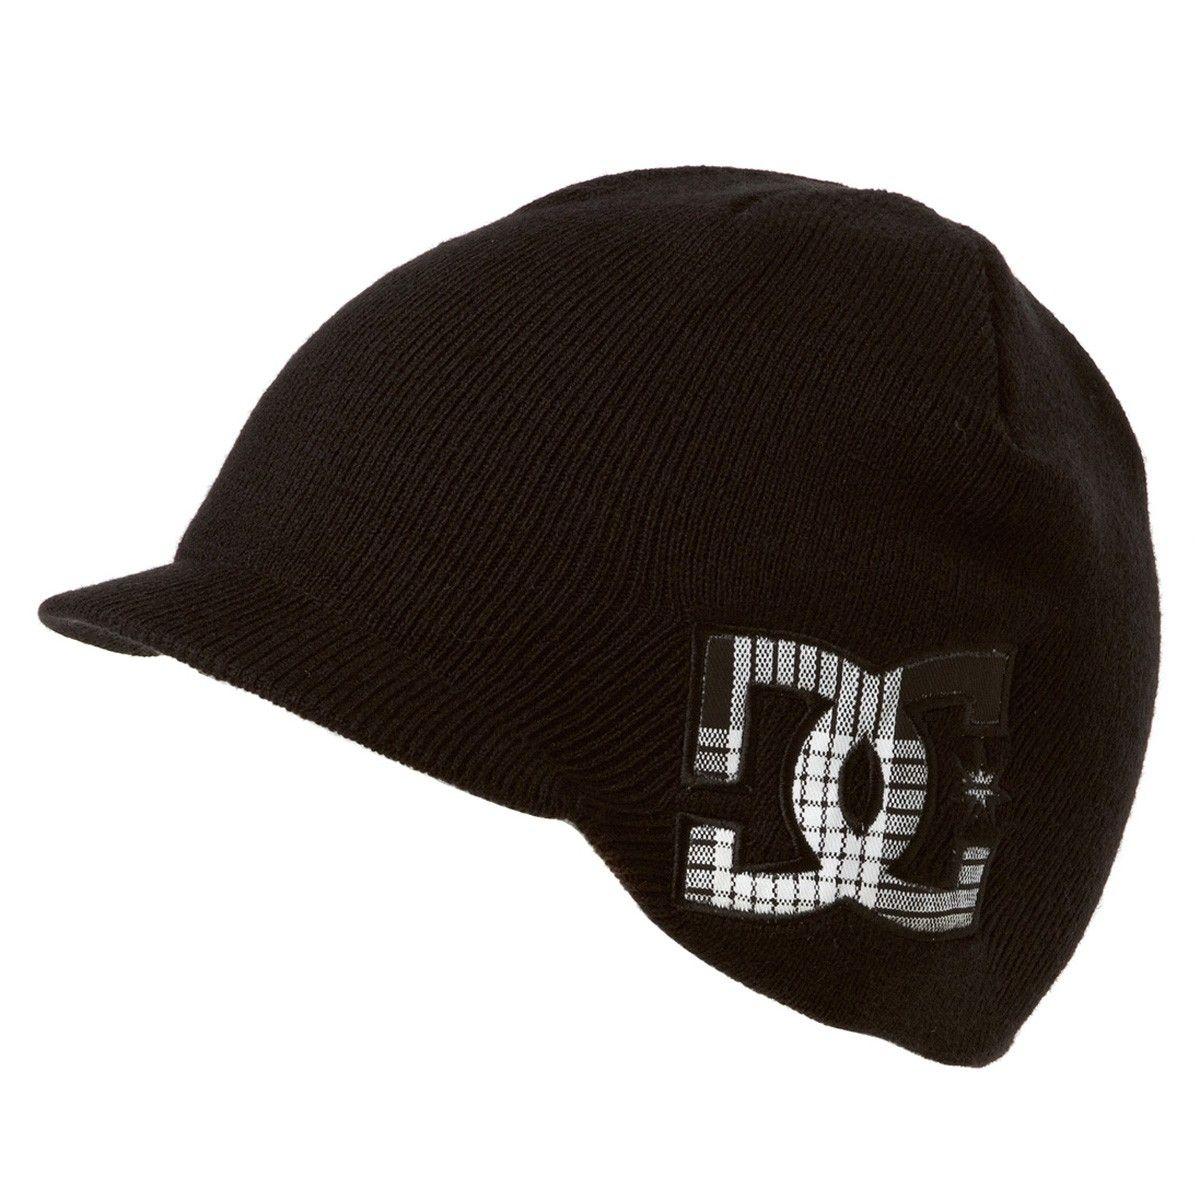 9c0e7e89ddd DC Shoes bonnet Archway visor beanie noir 30€  dc  dcshoes  bonnet  beanie   bonnets  beanies